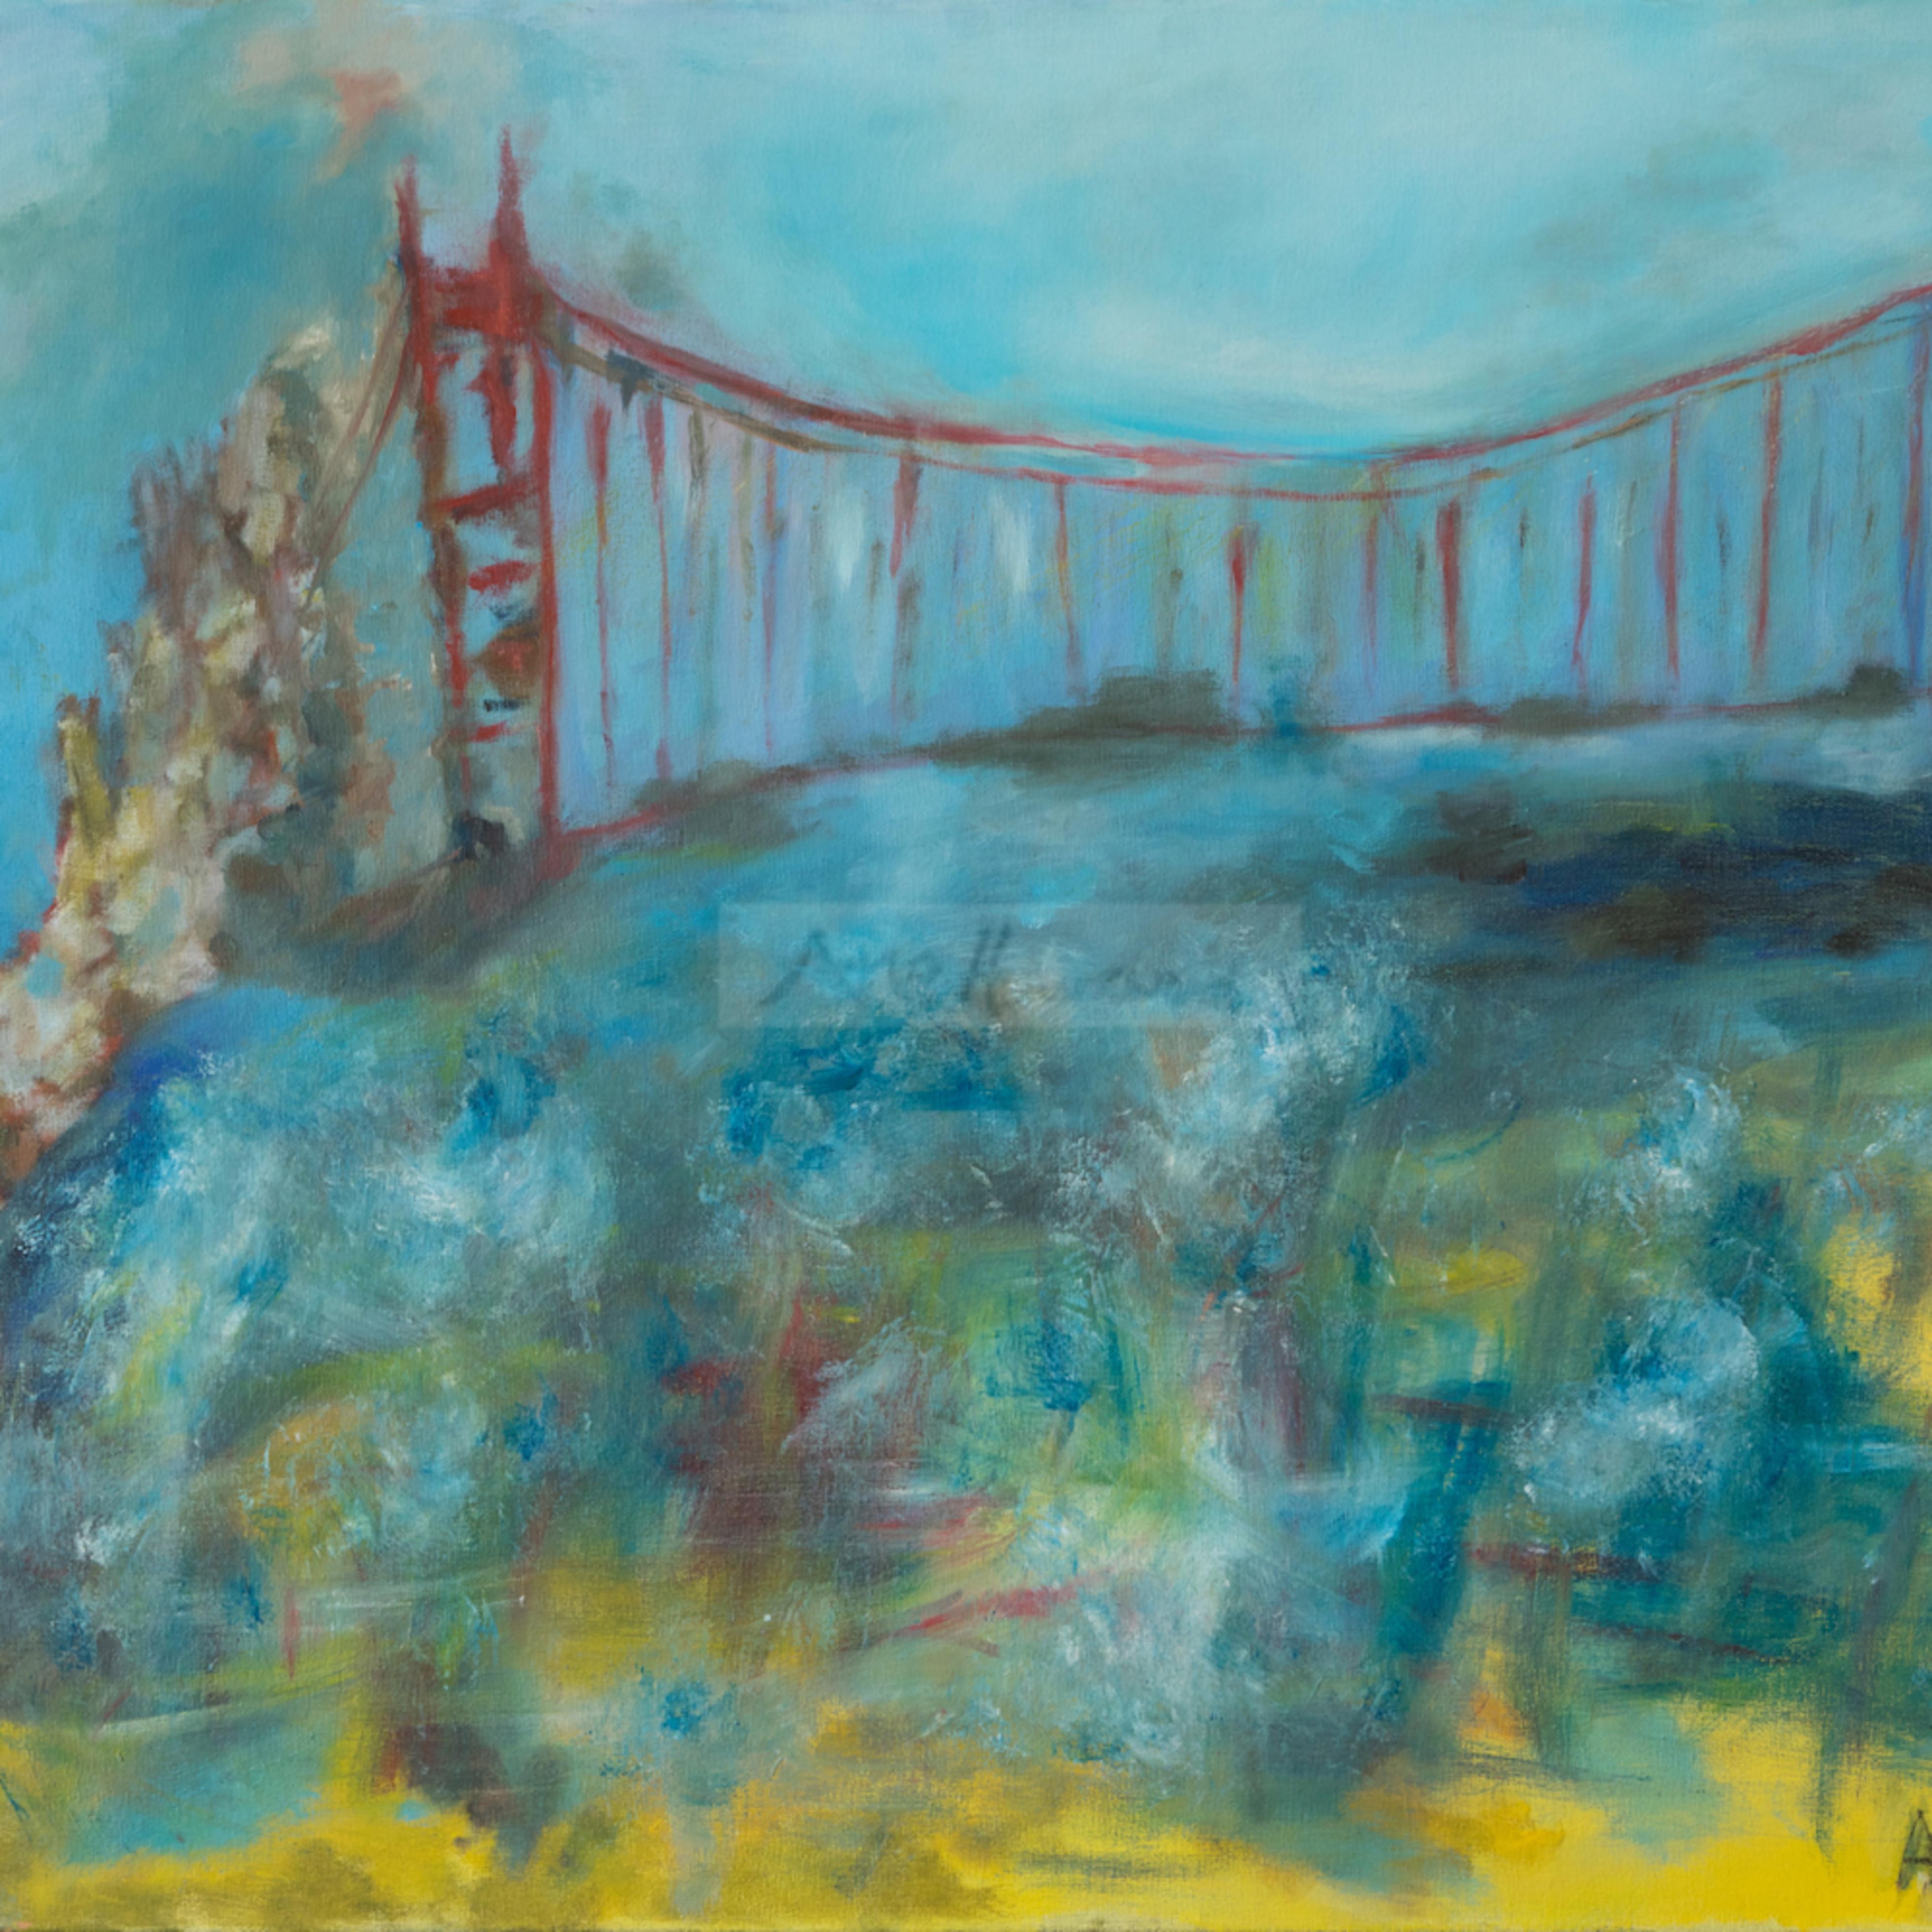 Angels visiting golden gate bridge   ane howard paintings 02 rt2nbw